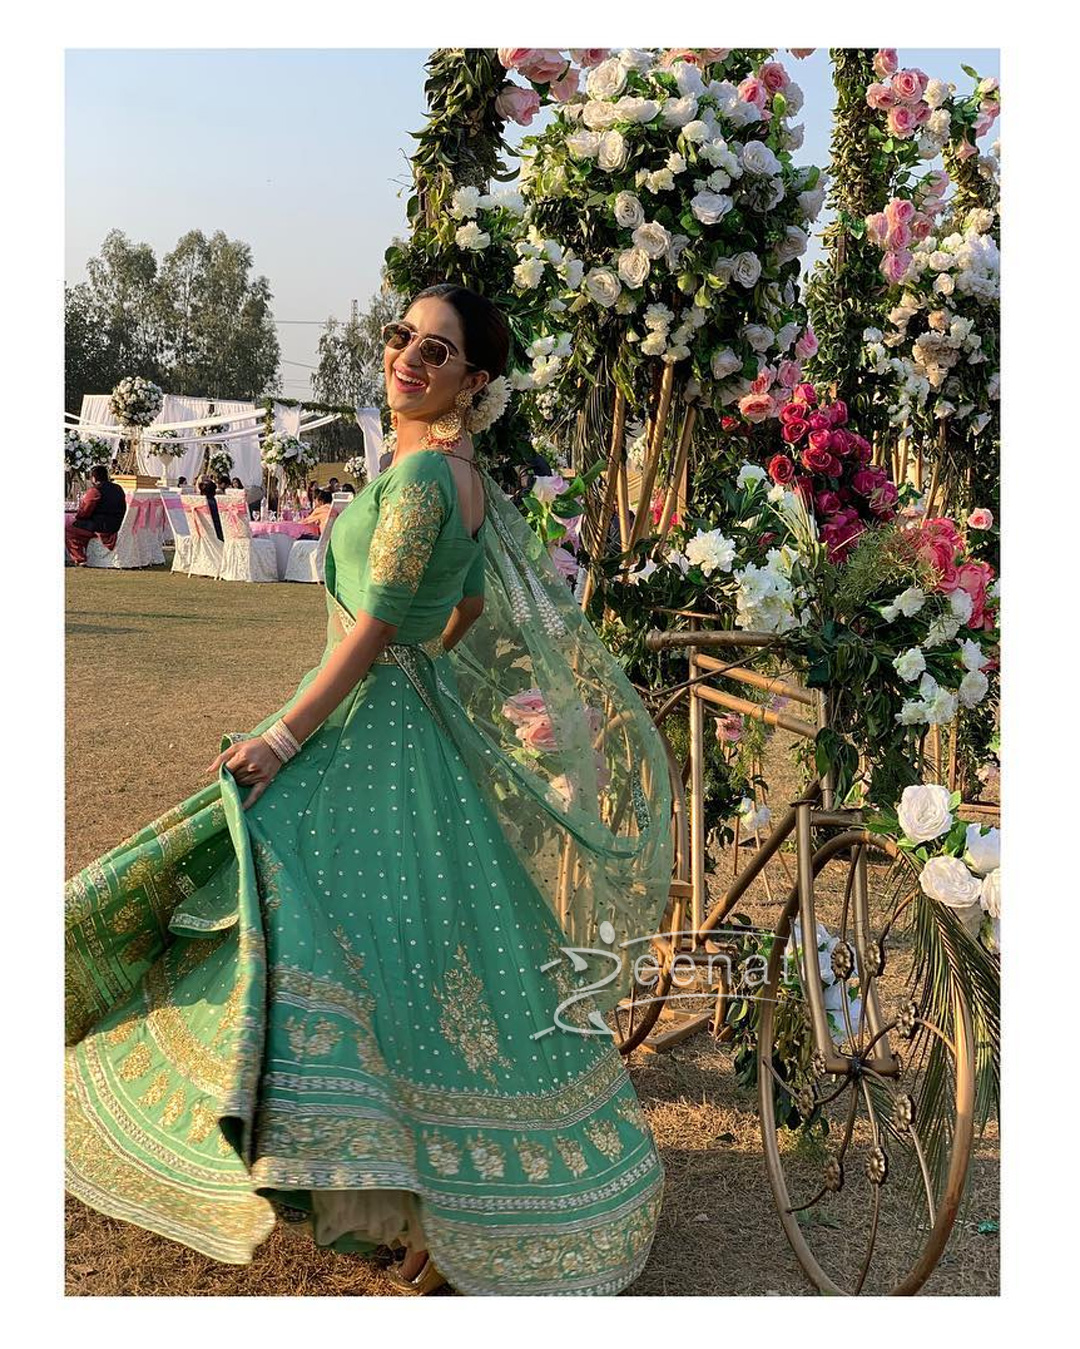 Saboor Aly in Green Lehenga Choli by Umer Sohail